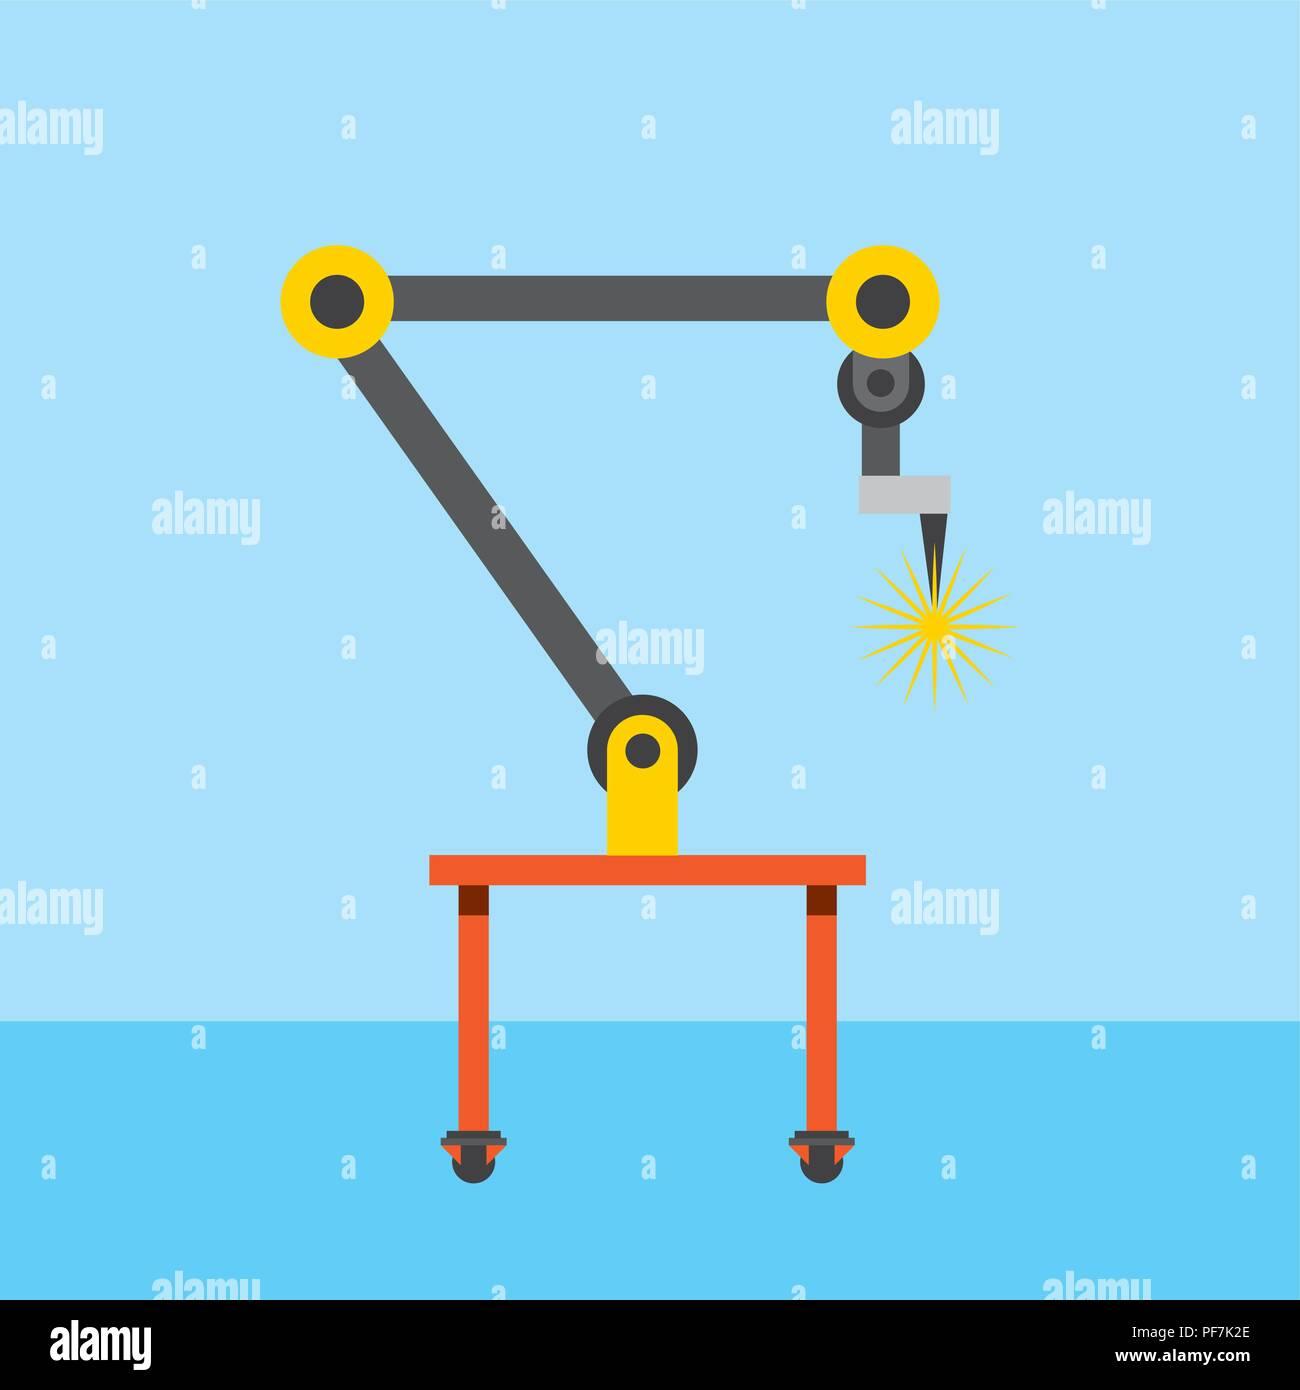 industrial welding robotic arm for automotive industry - Stock Image